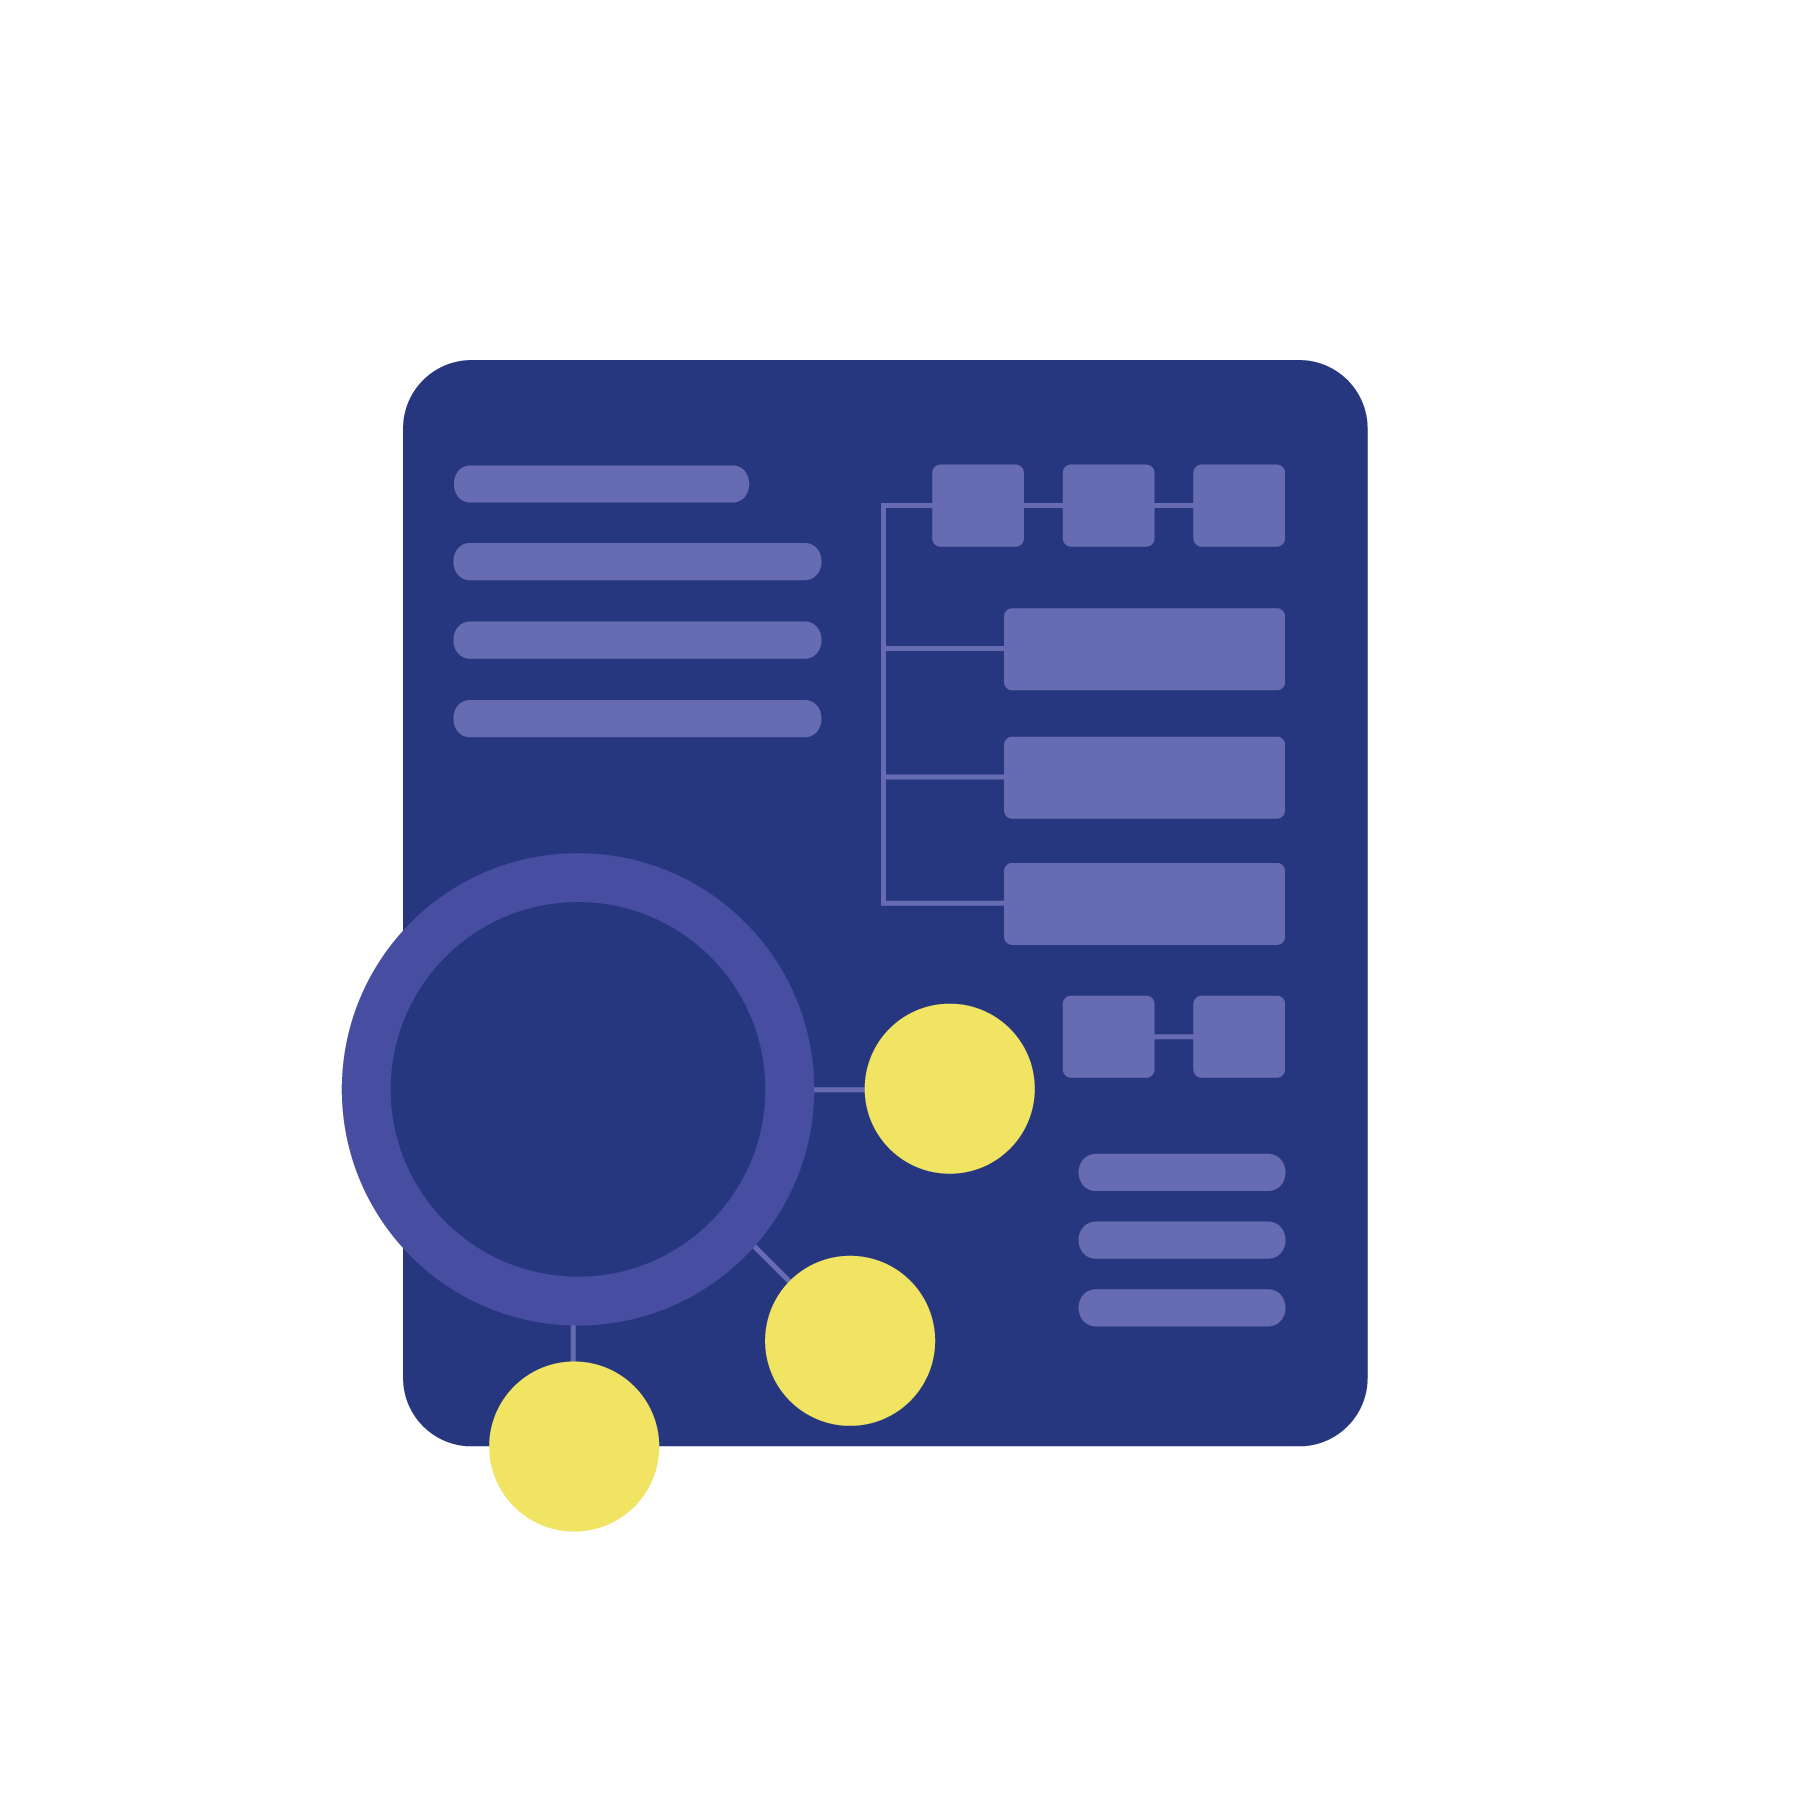 Flaco_Creative_Icon_Analytics_Marketing 2.png